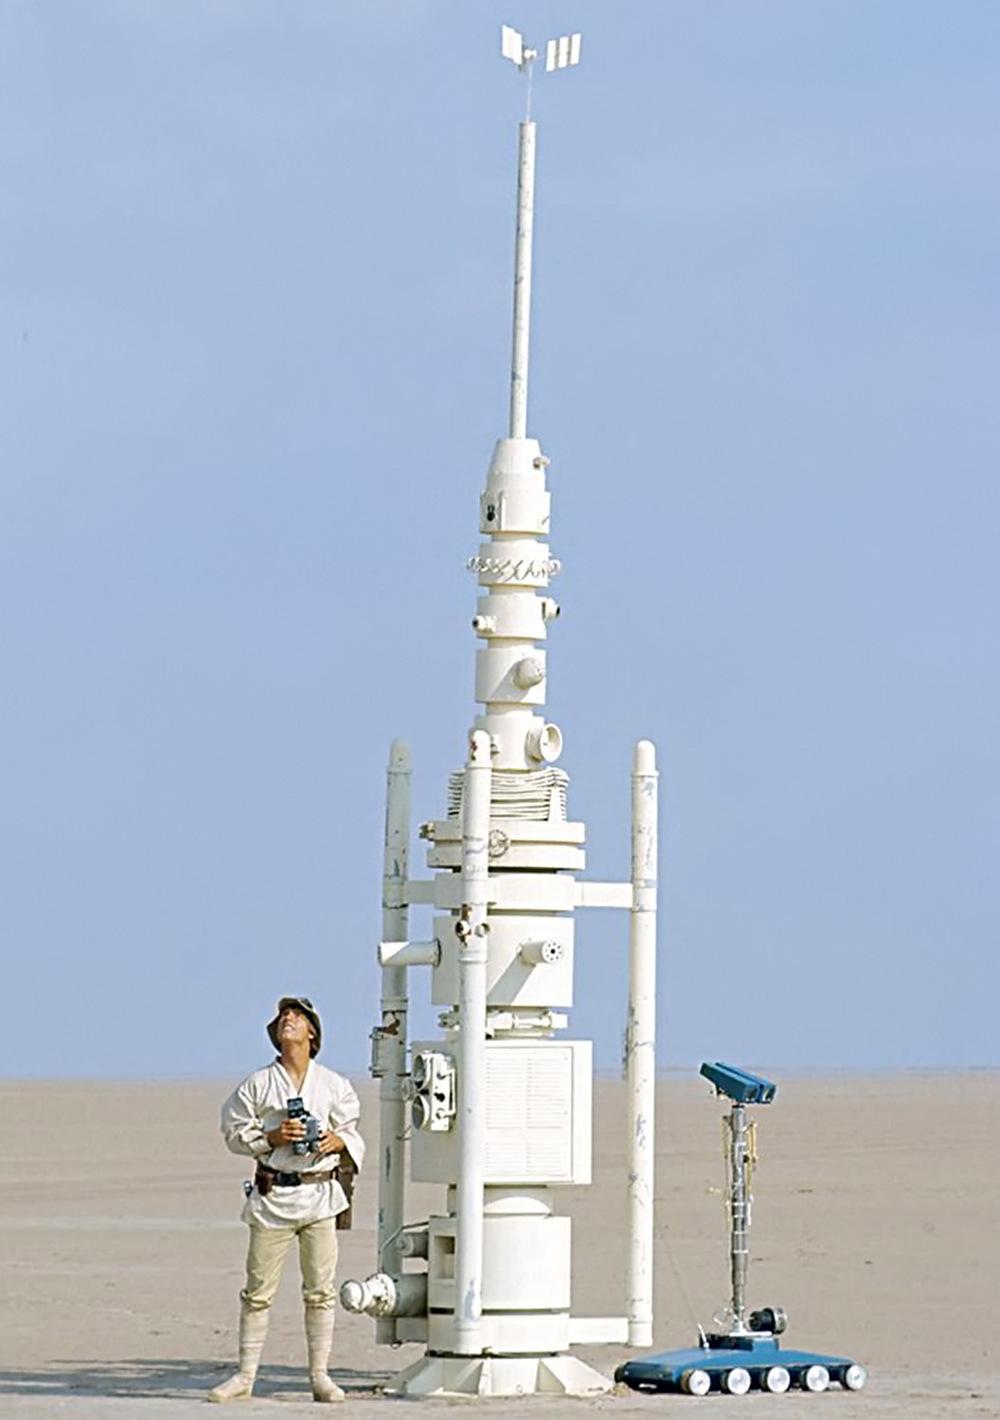 Luke Skywalker and a droid beside a moisture vaporator.Image from STAR WARS - EPISODE IV - A NEW HOPE © Lucasfilm, Ltd.